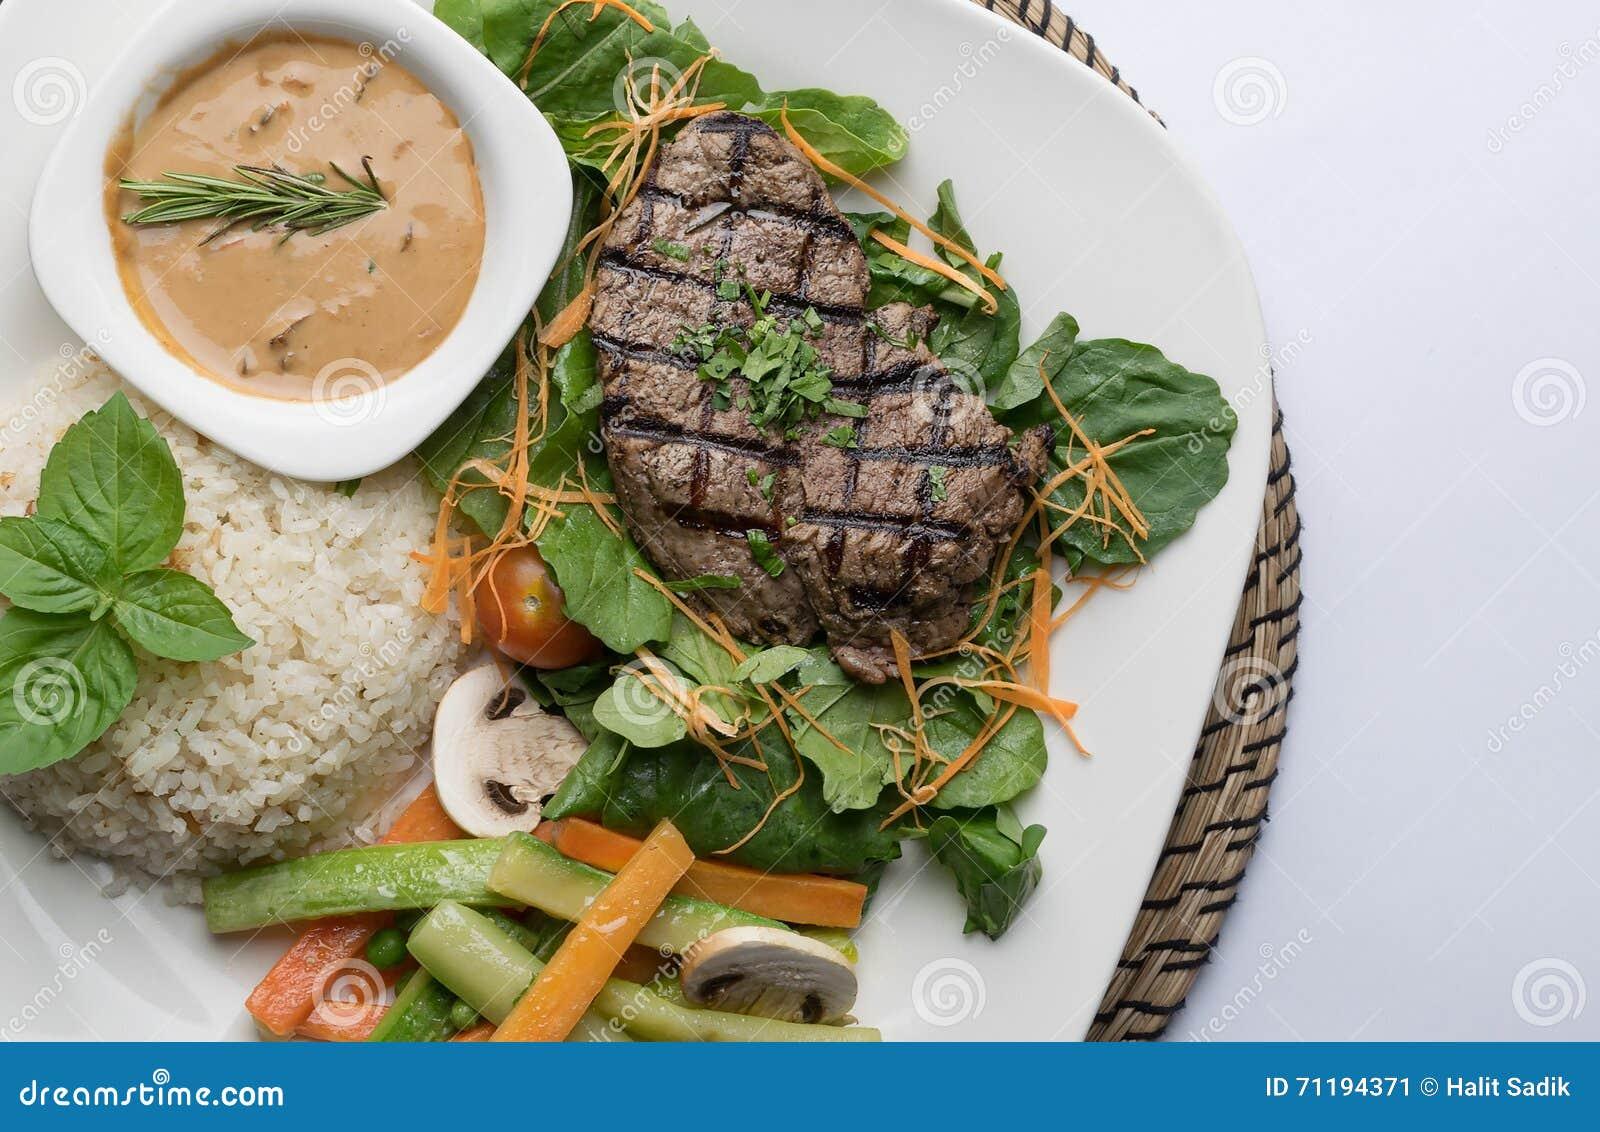 Beef filet steak served with rice, vegetables, and mushroom